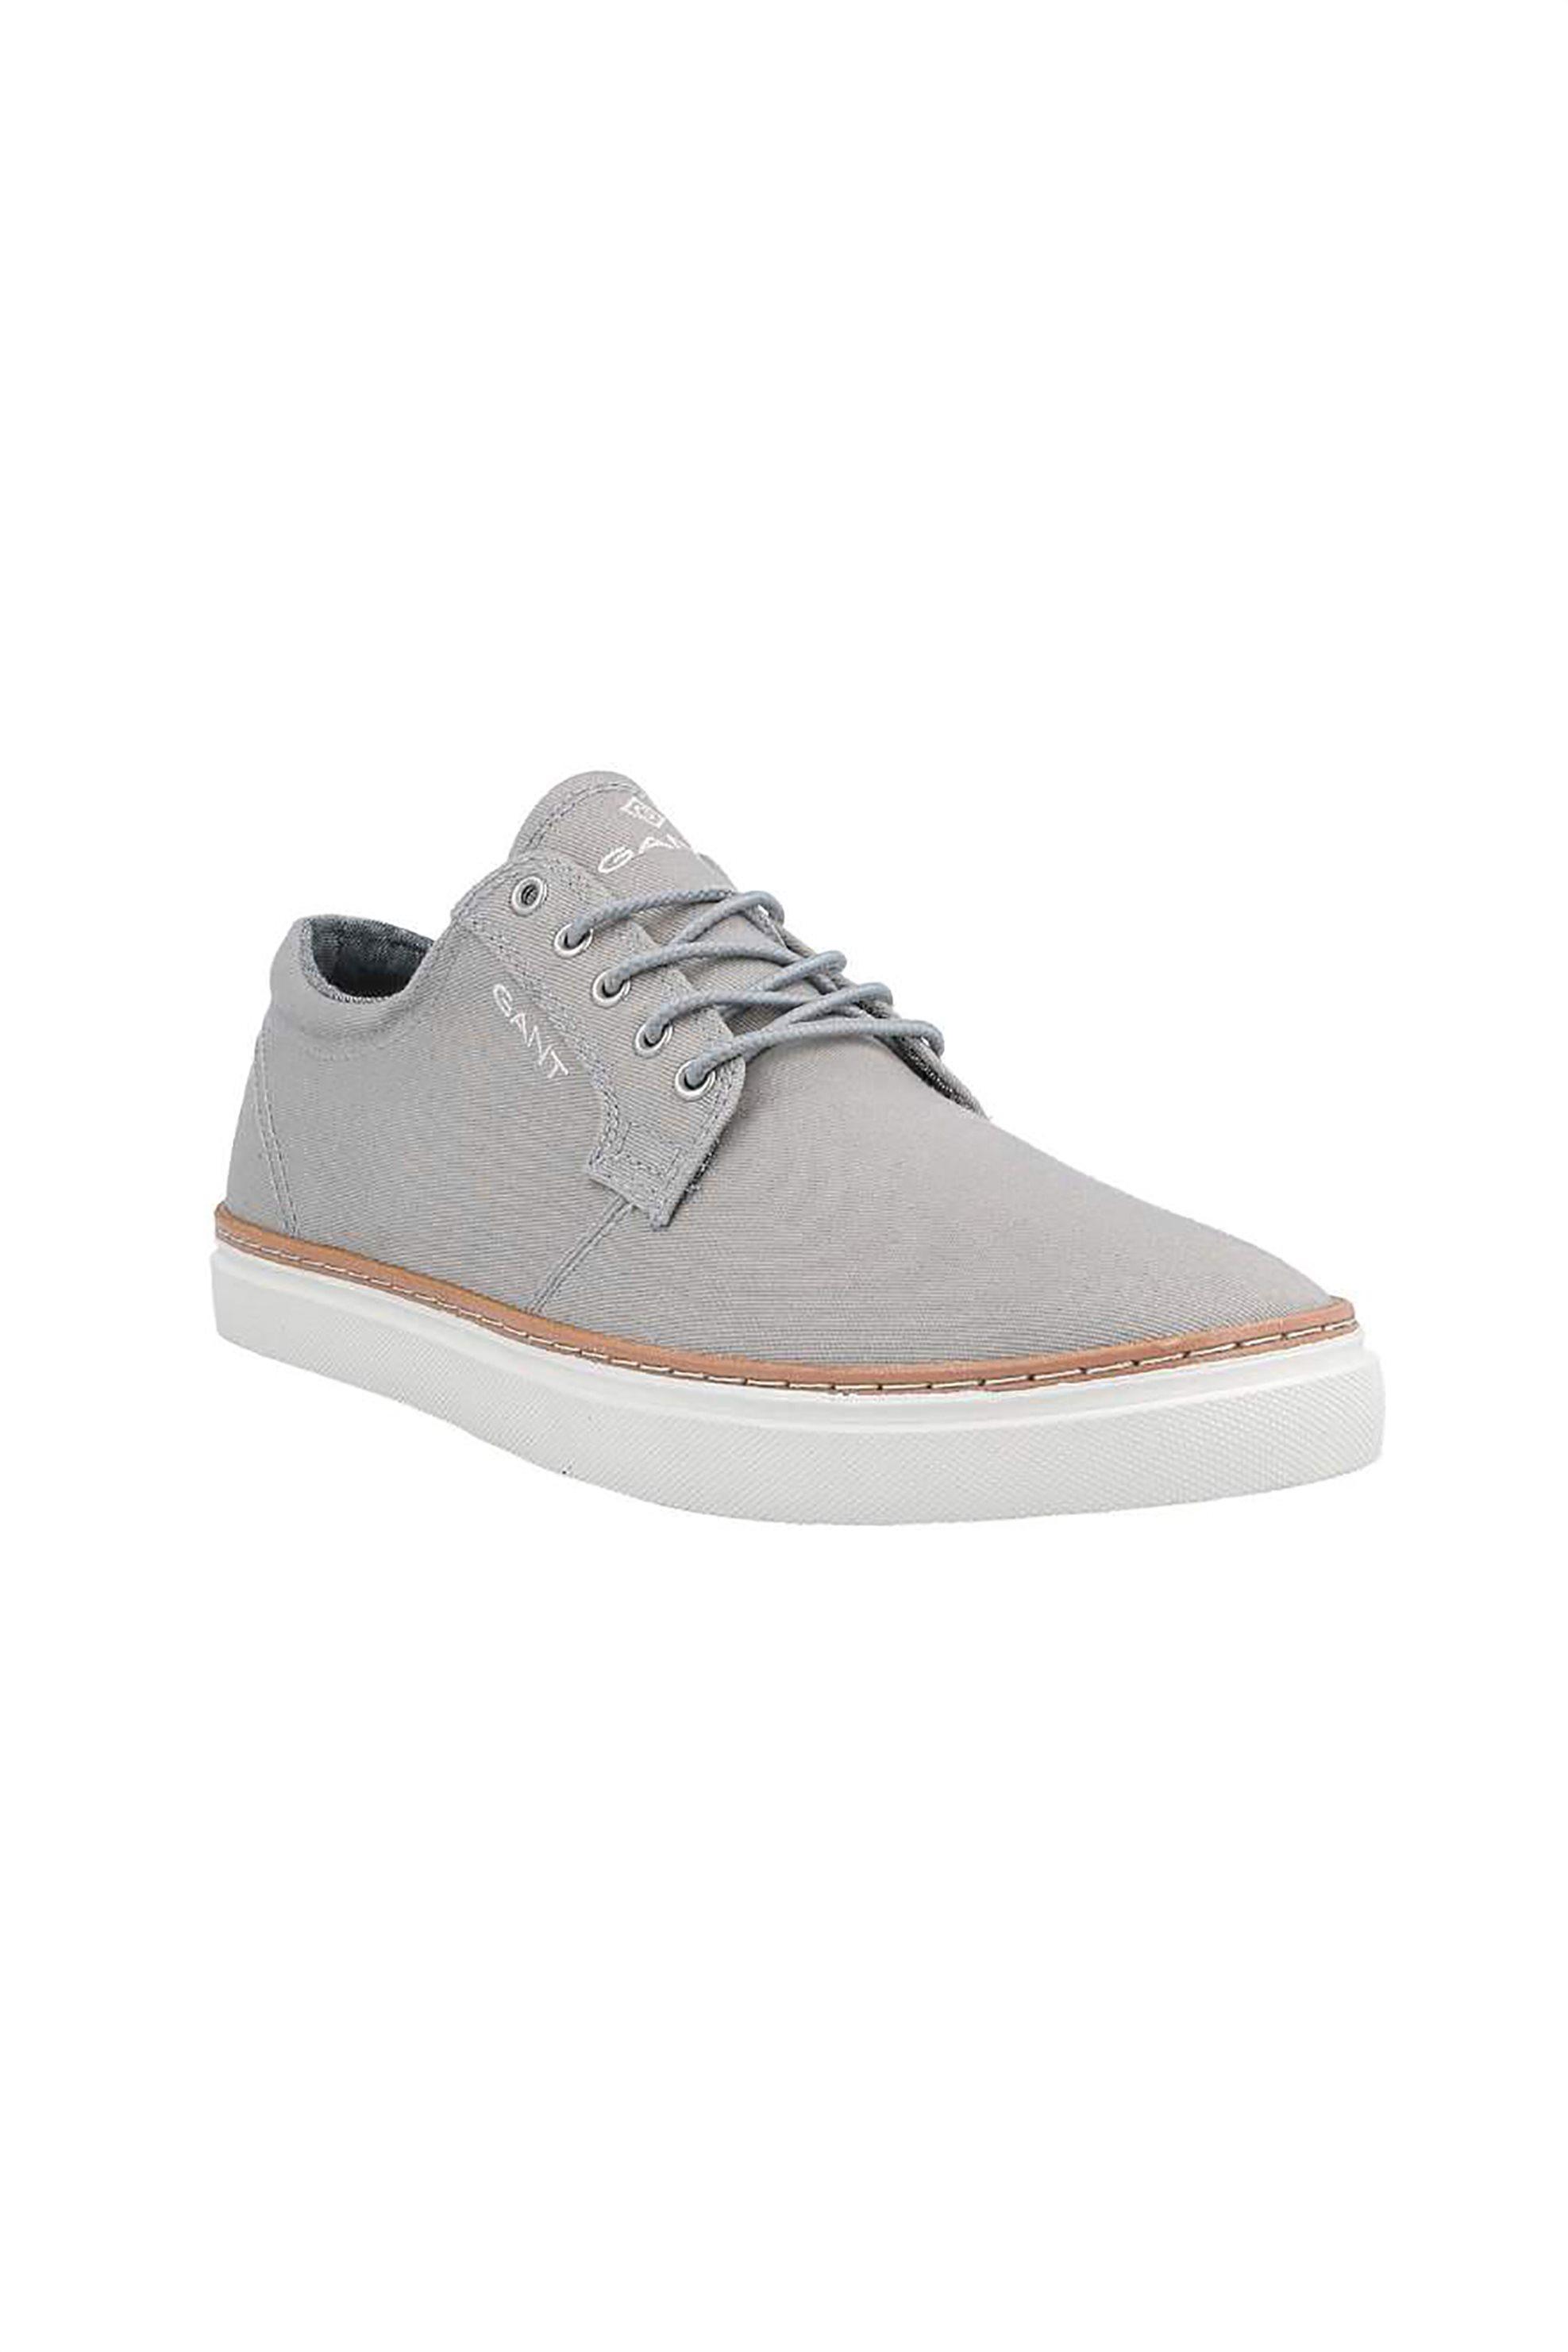 "Gant ανδρικά sneakers με κορδόνια ""Prepville"" – 20638496 – Γκρι"